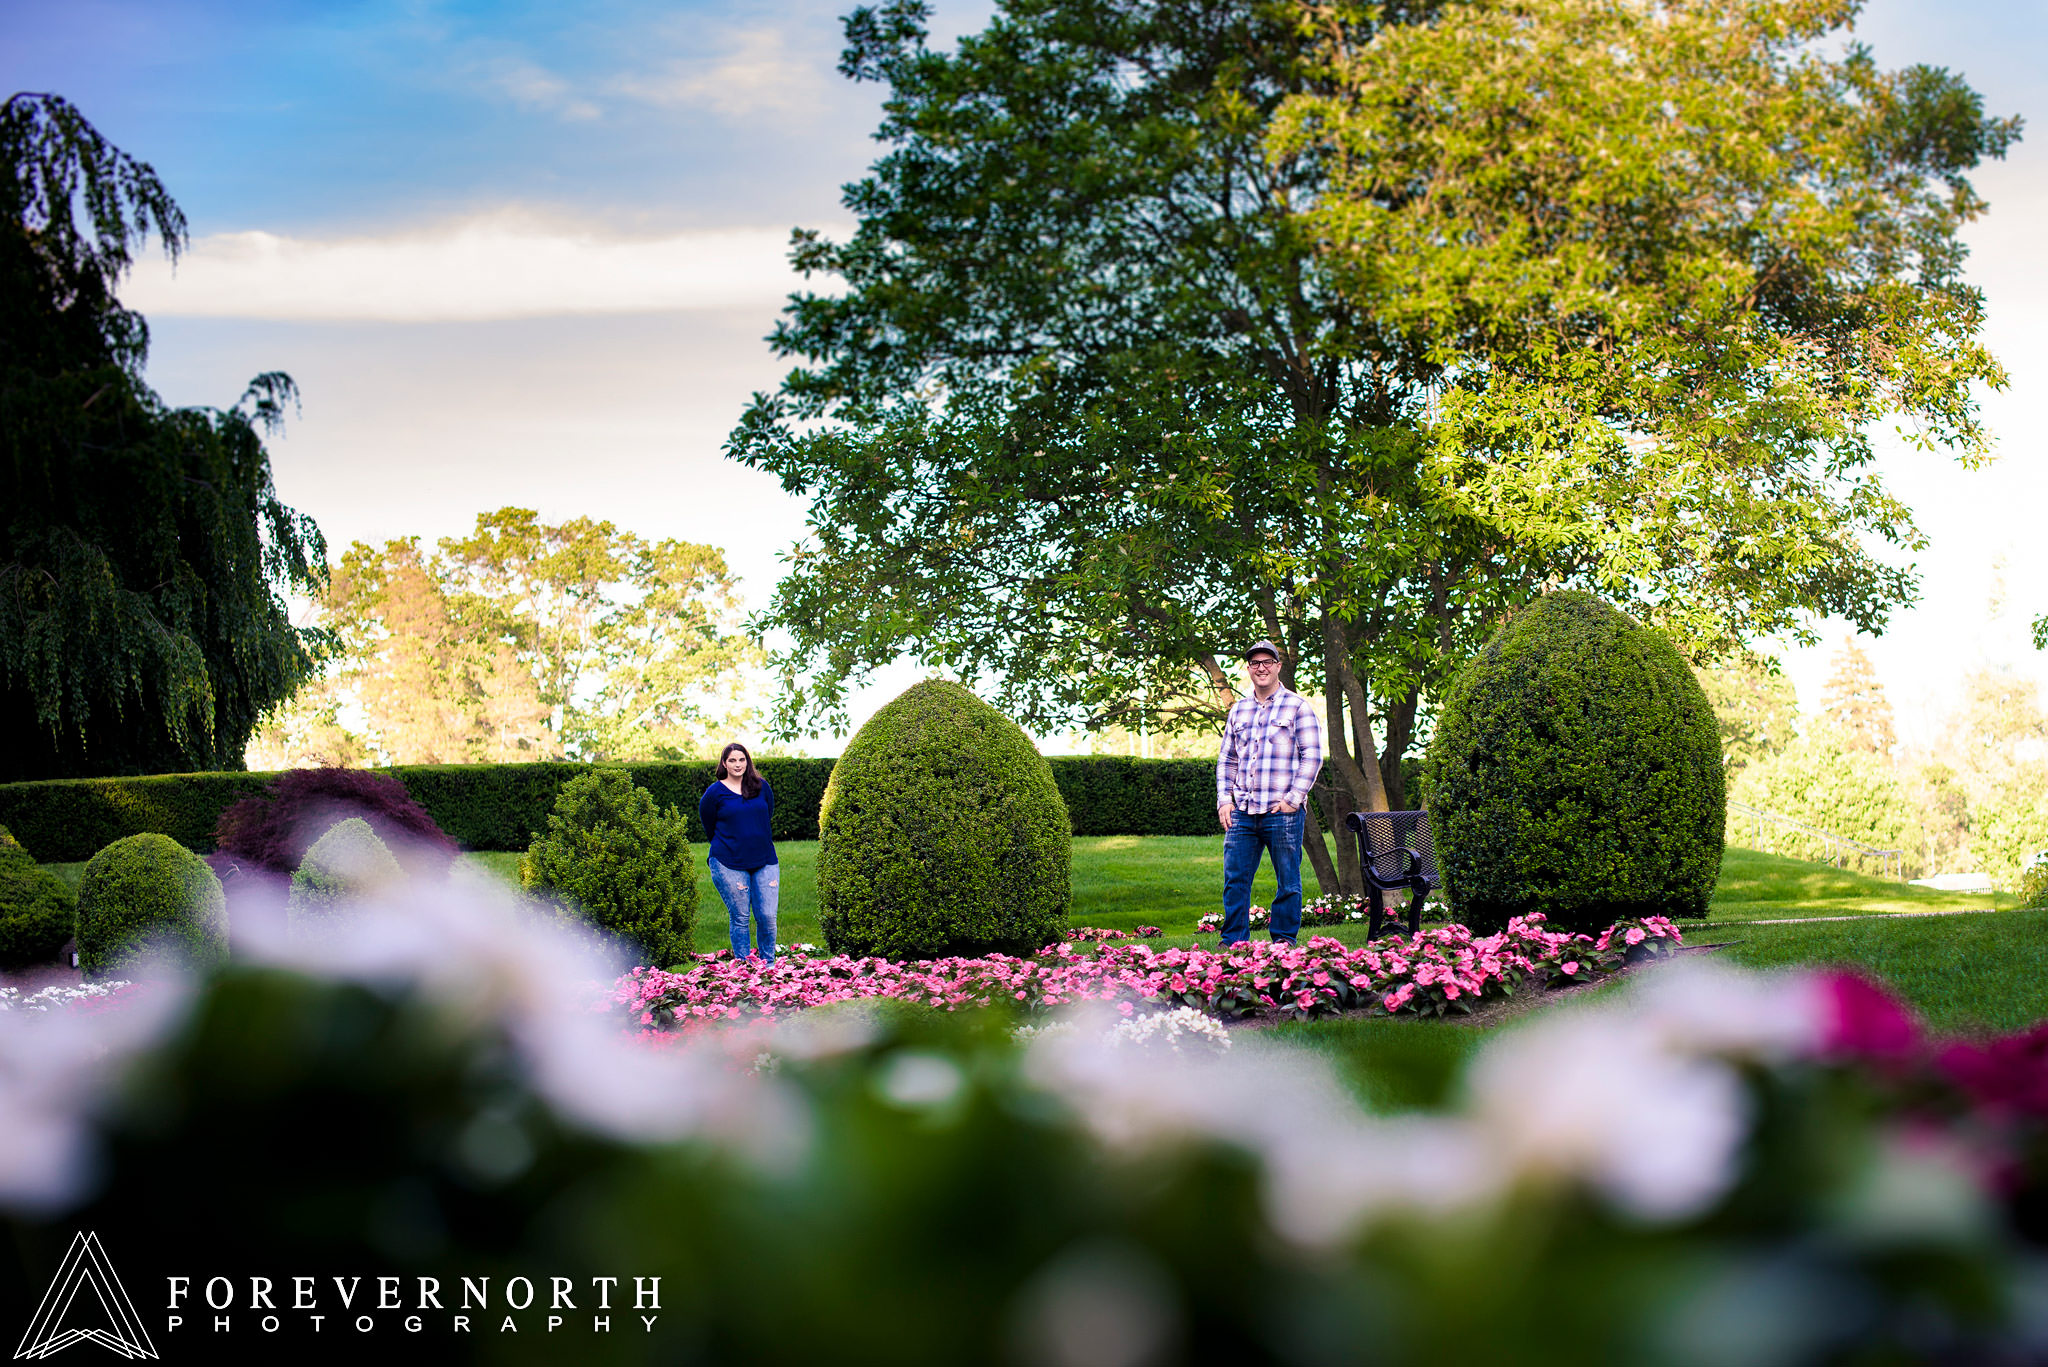 Brown-Monmouth-Gardens-Engagement-Photos06.JPG